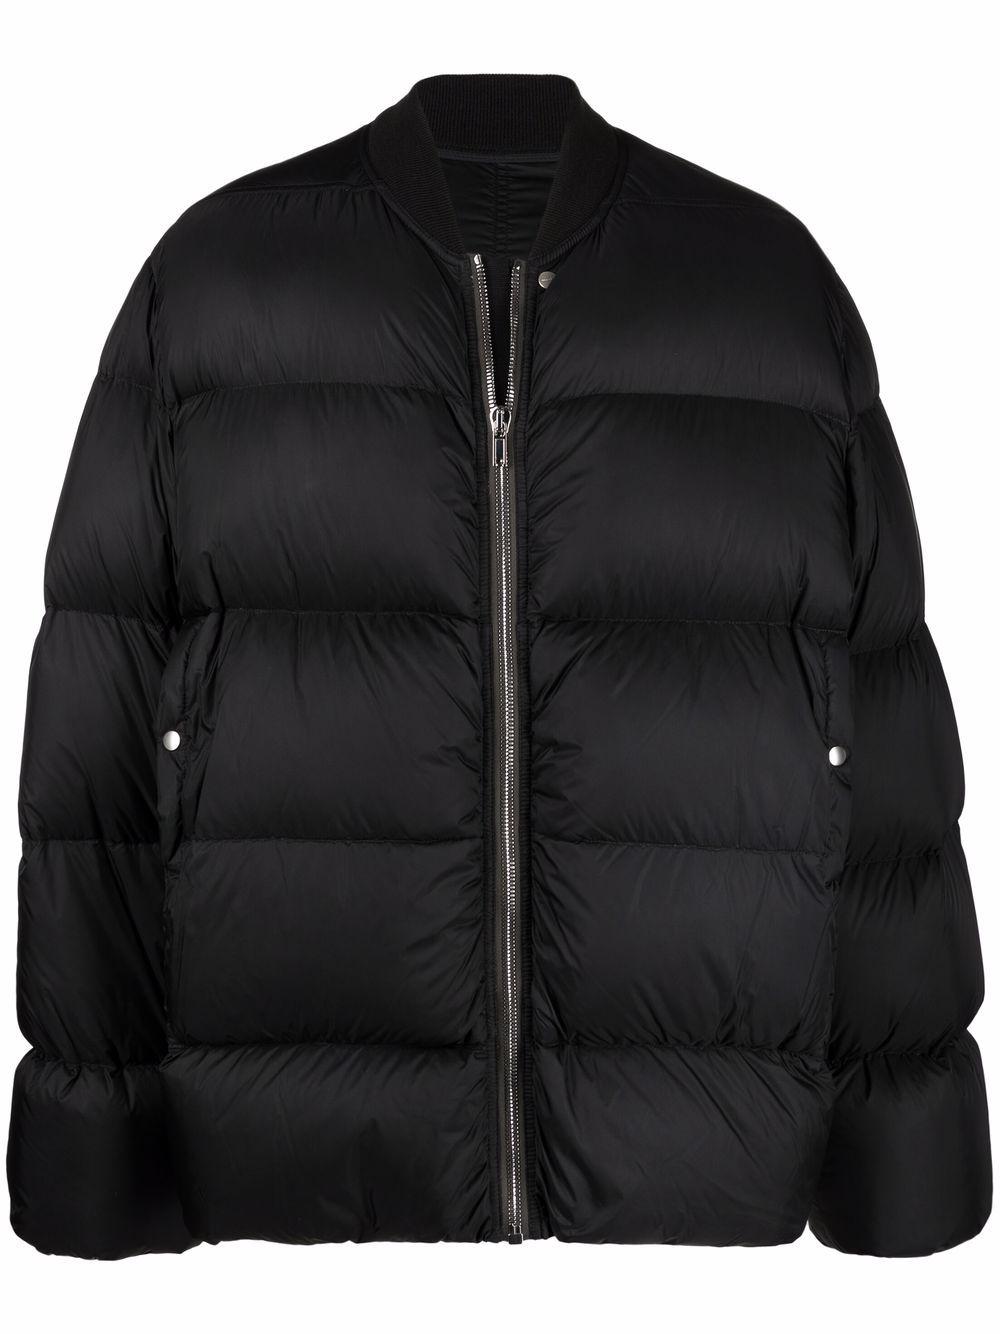 piumino oversize uomo nero in piuma d'oca RICK OWENS | Giacche | RU02A5788 NZD309